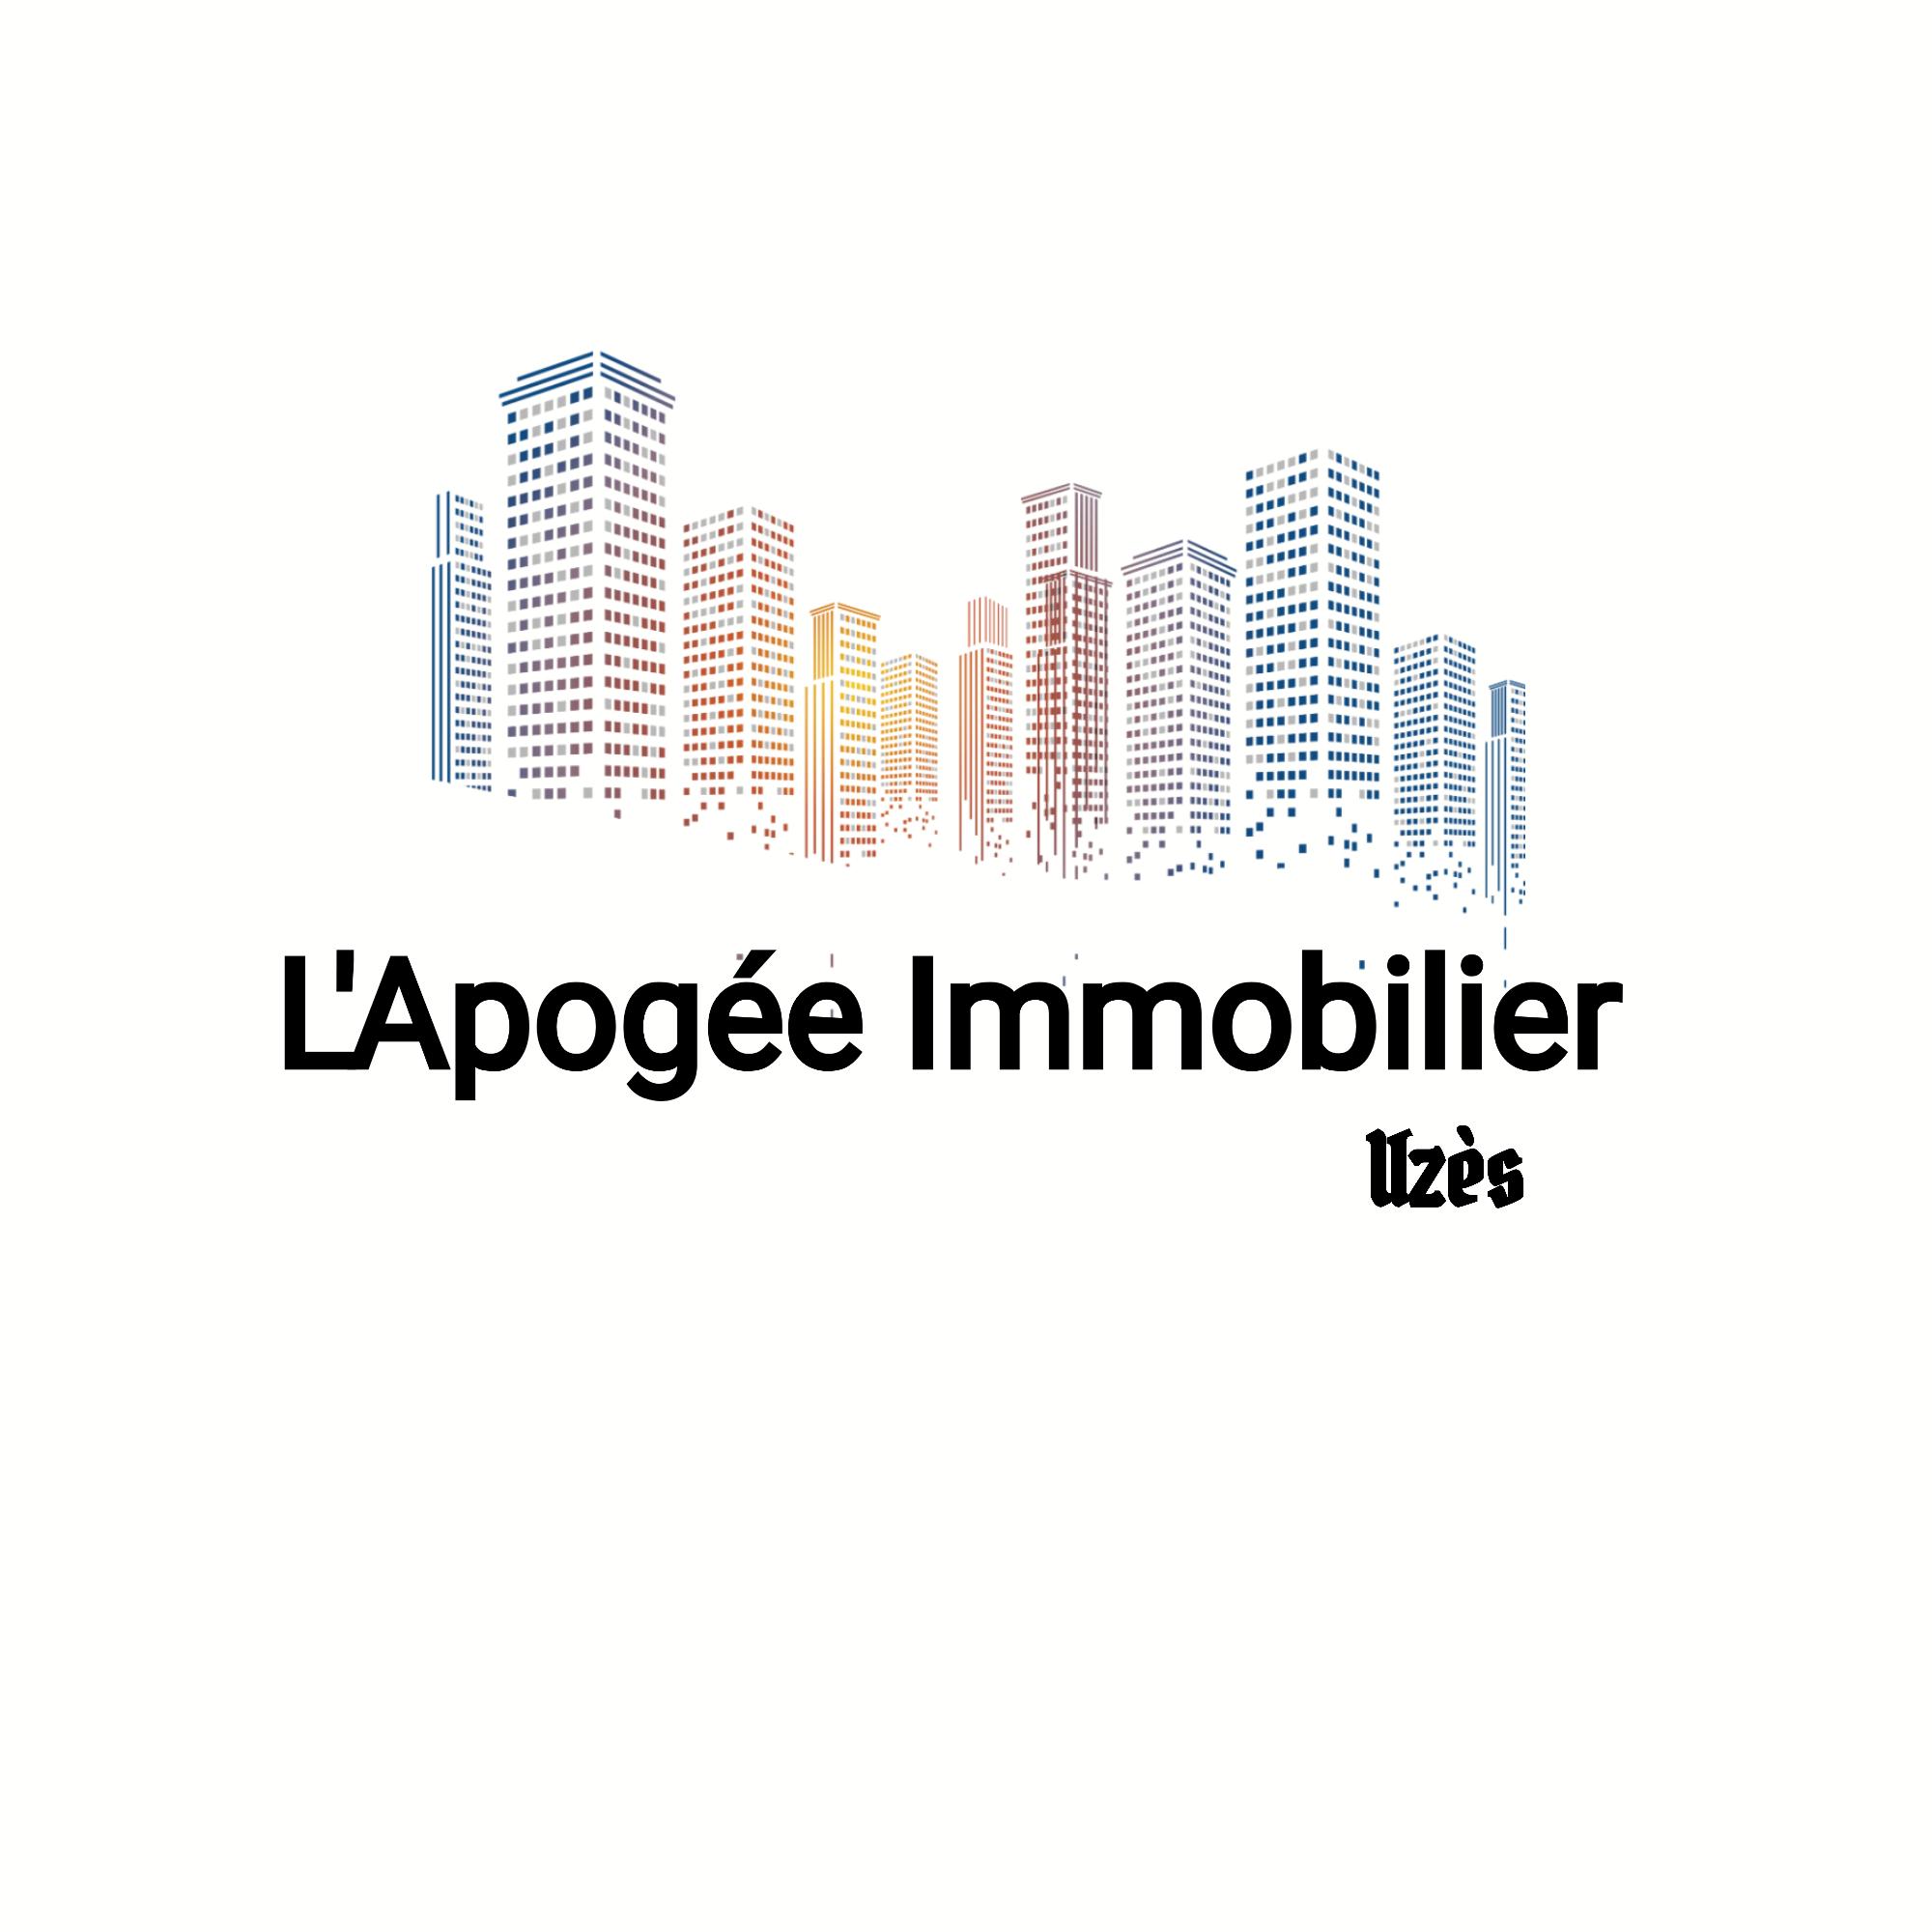 logo blanc -L'APOGEE IMMOBILIER